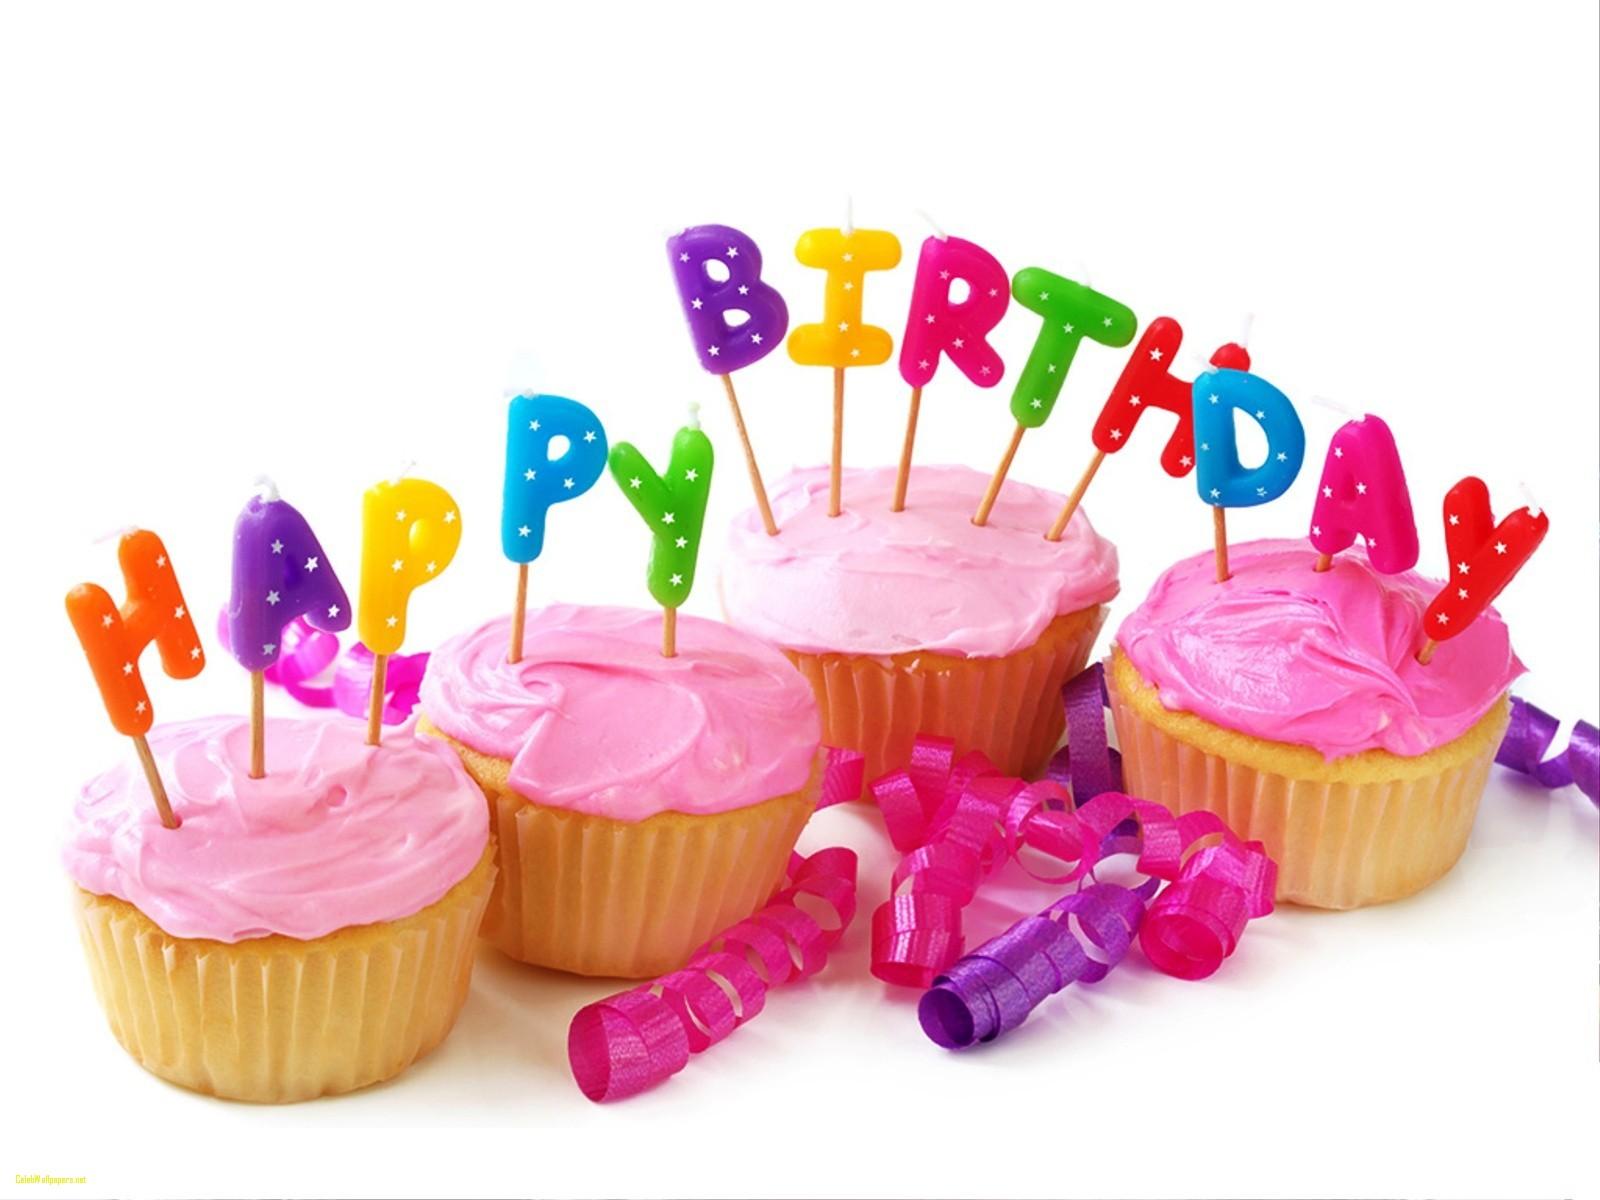 1600x1200 Birthday Image Download Free Birthday Cake Modern Happy Birthday